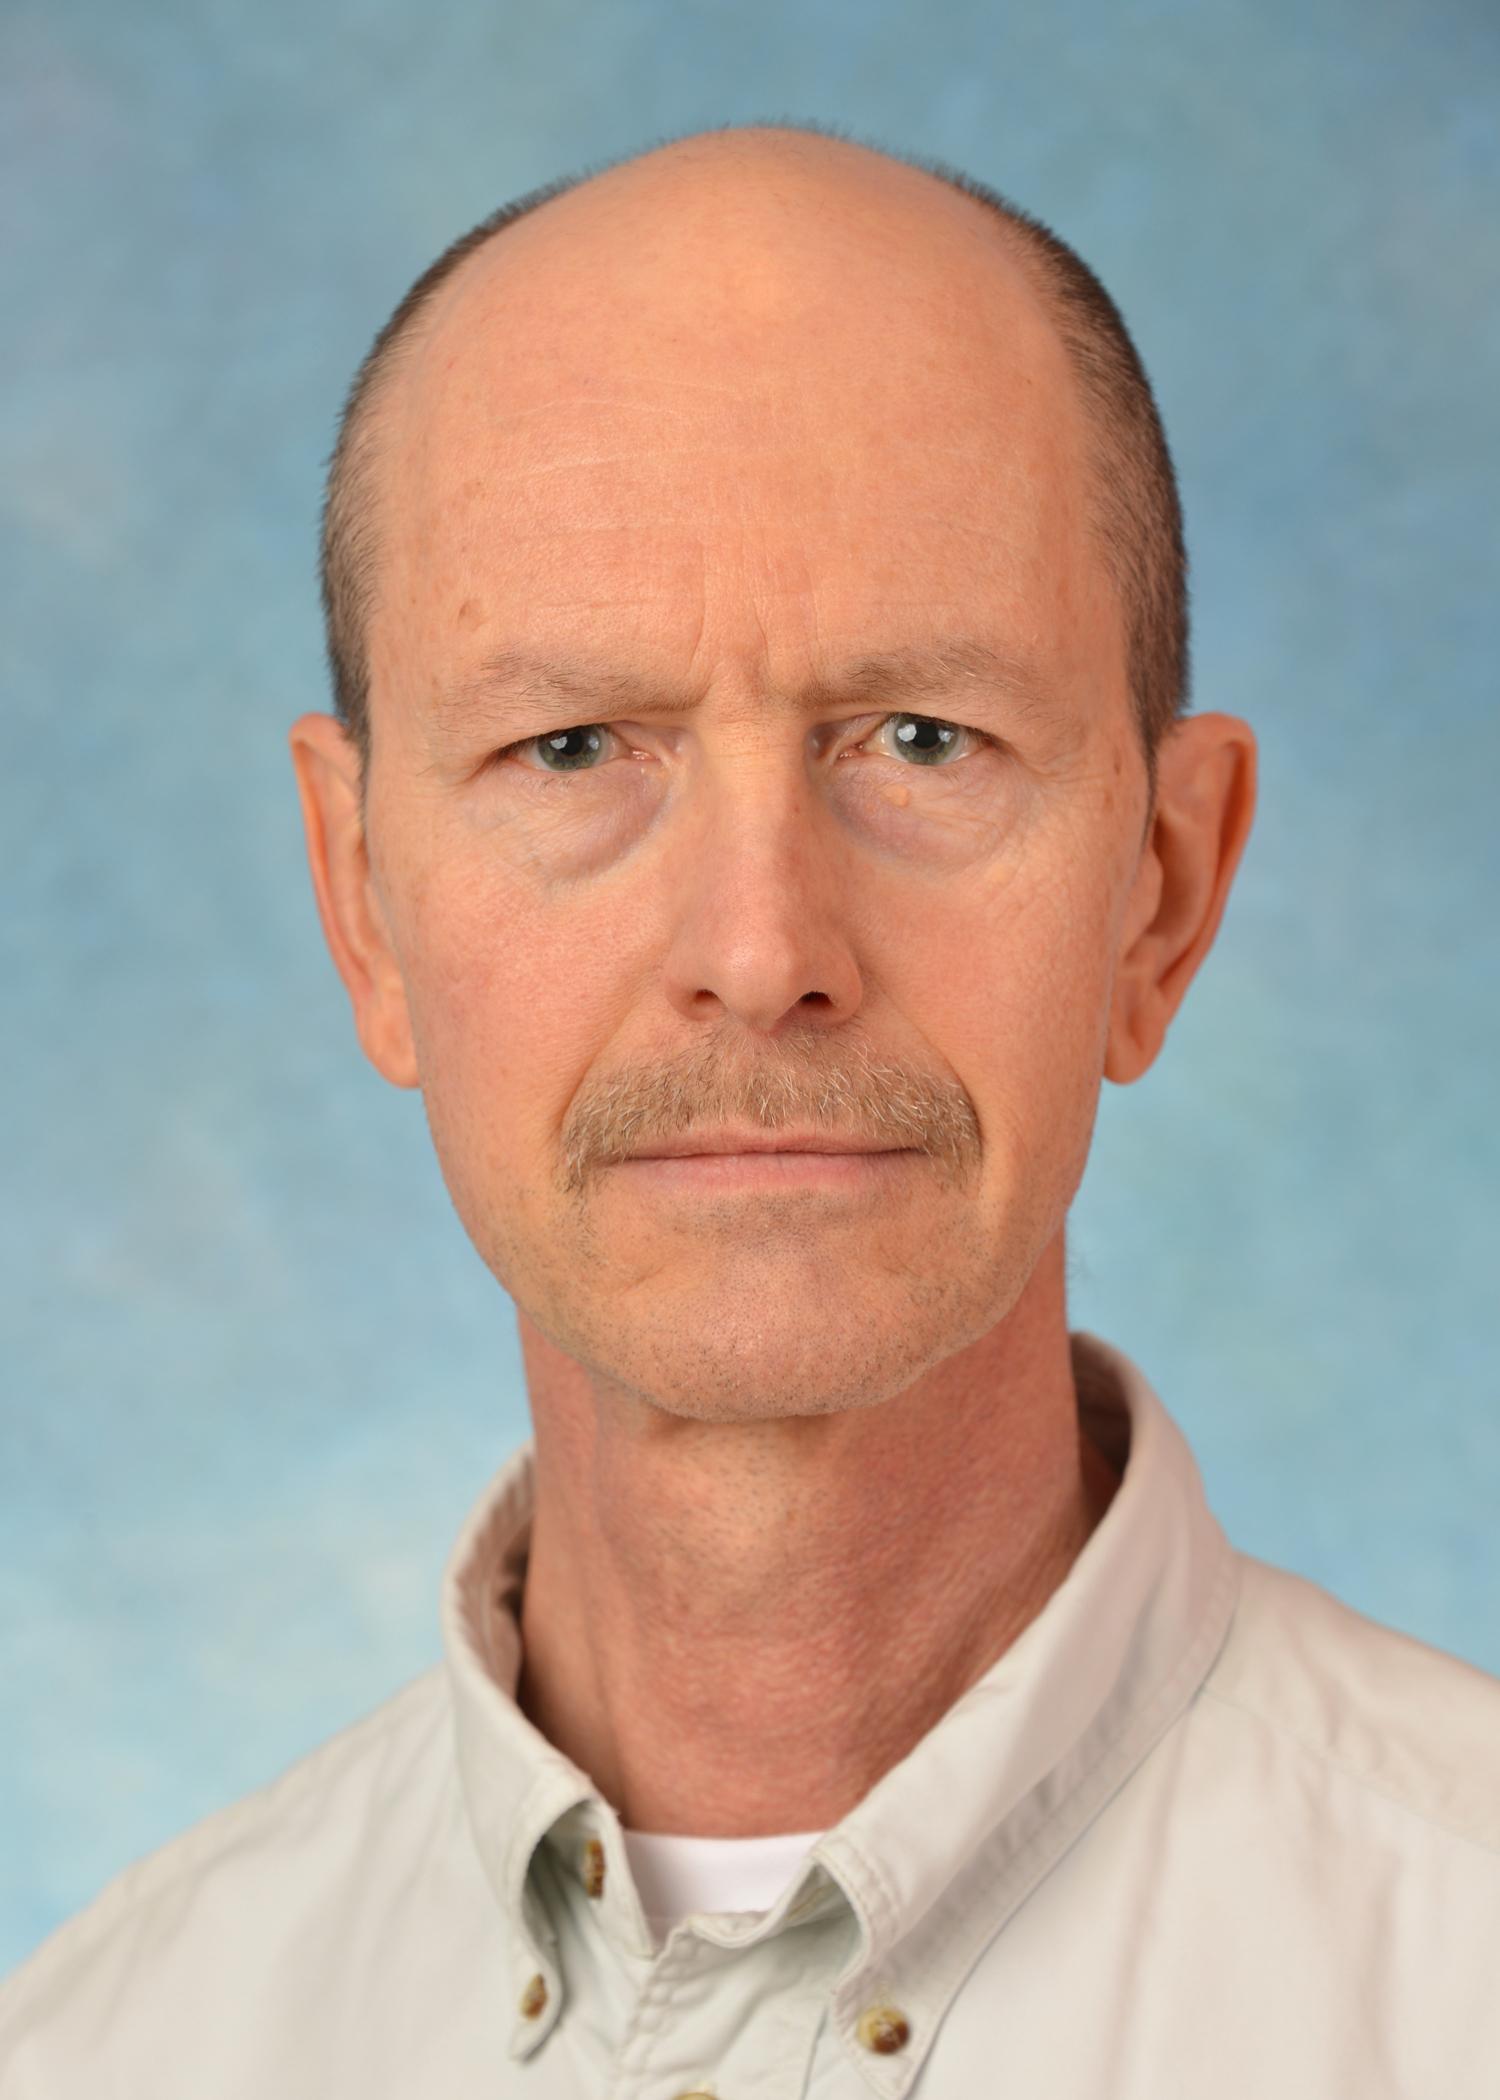 photo of Chris Selby PhD of Sancar lab